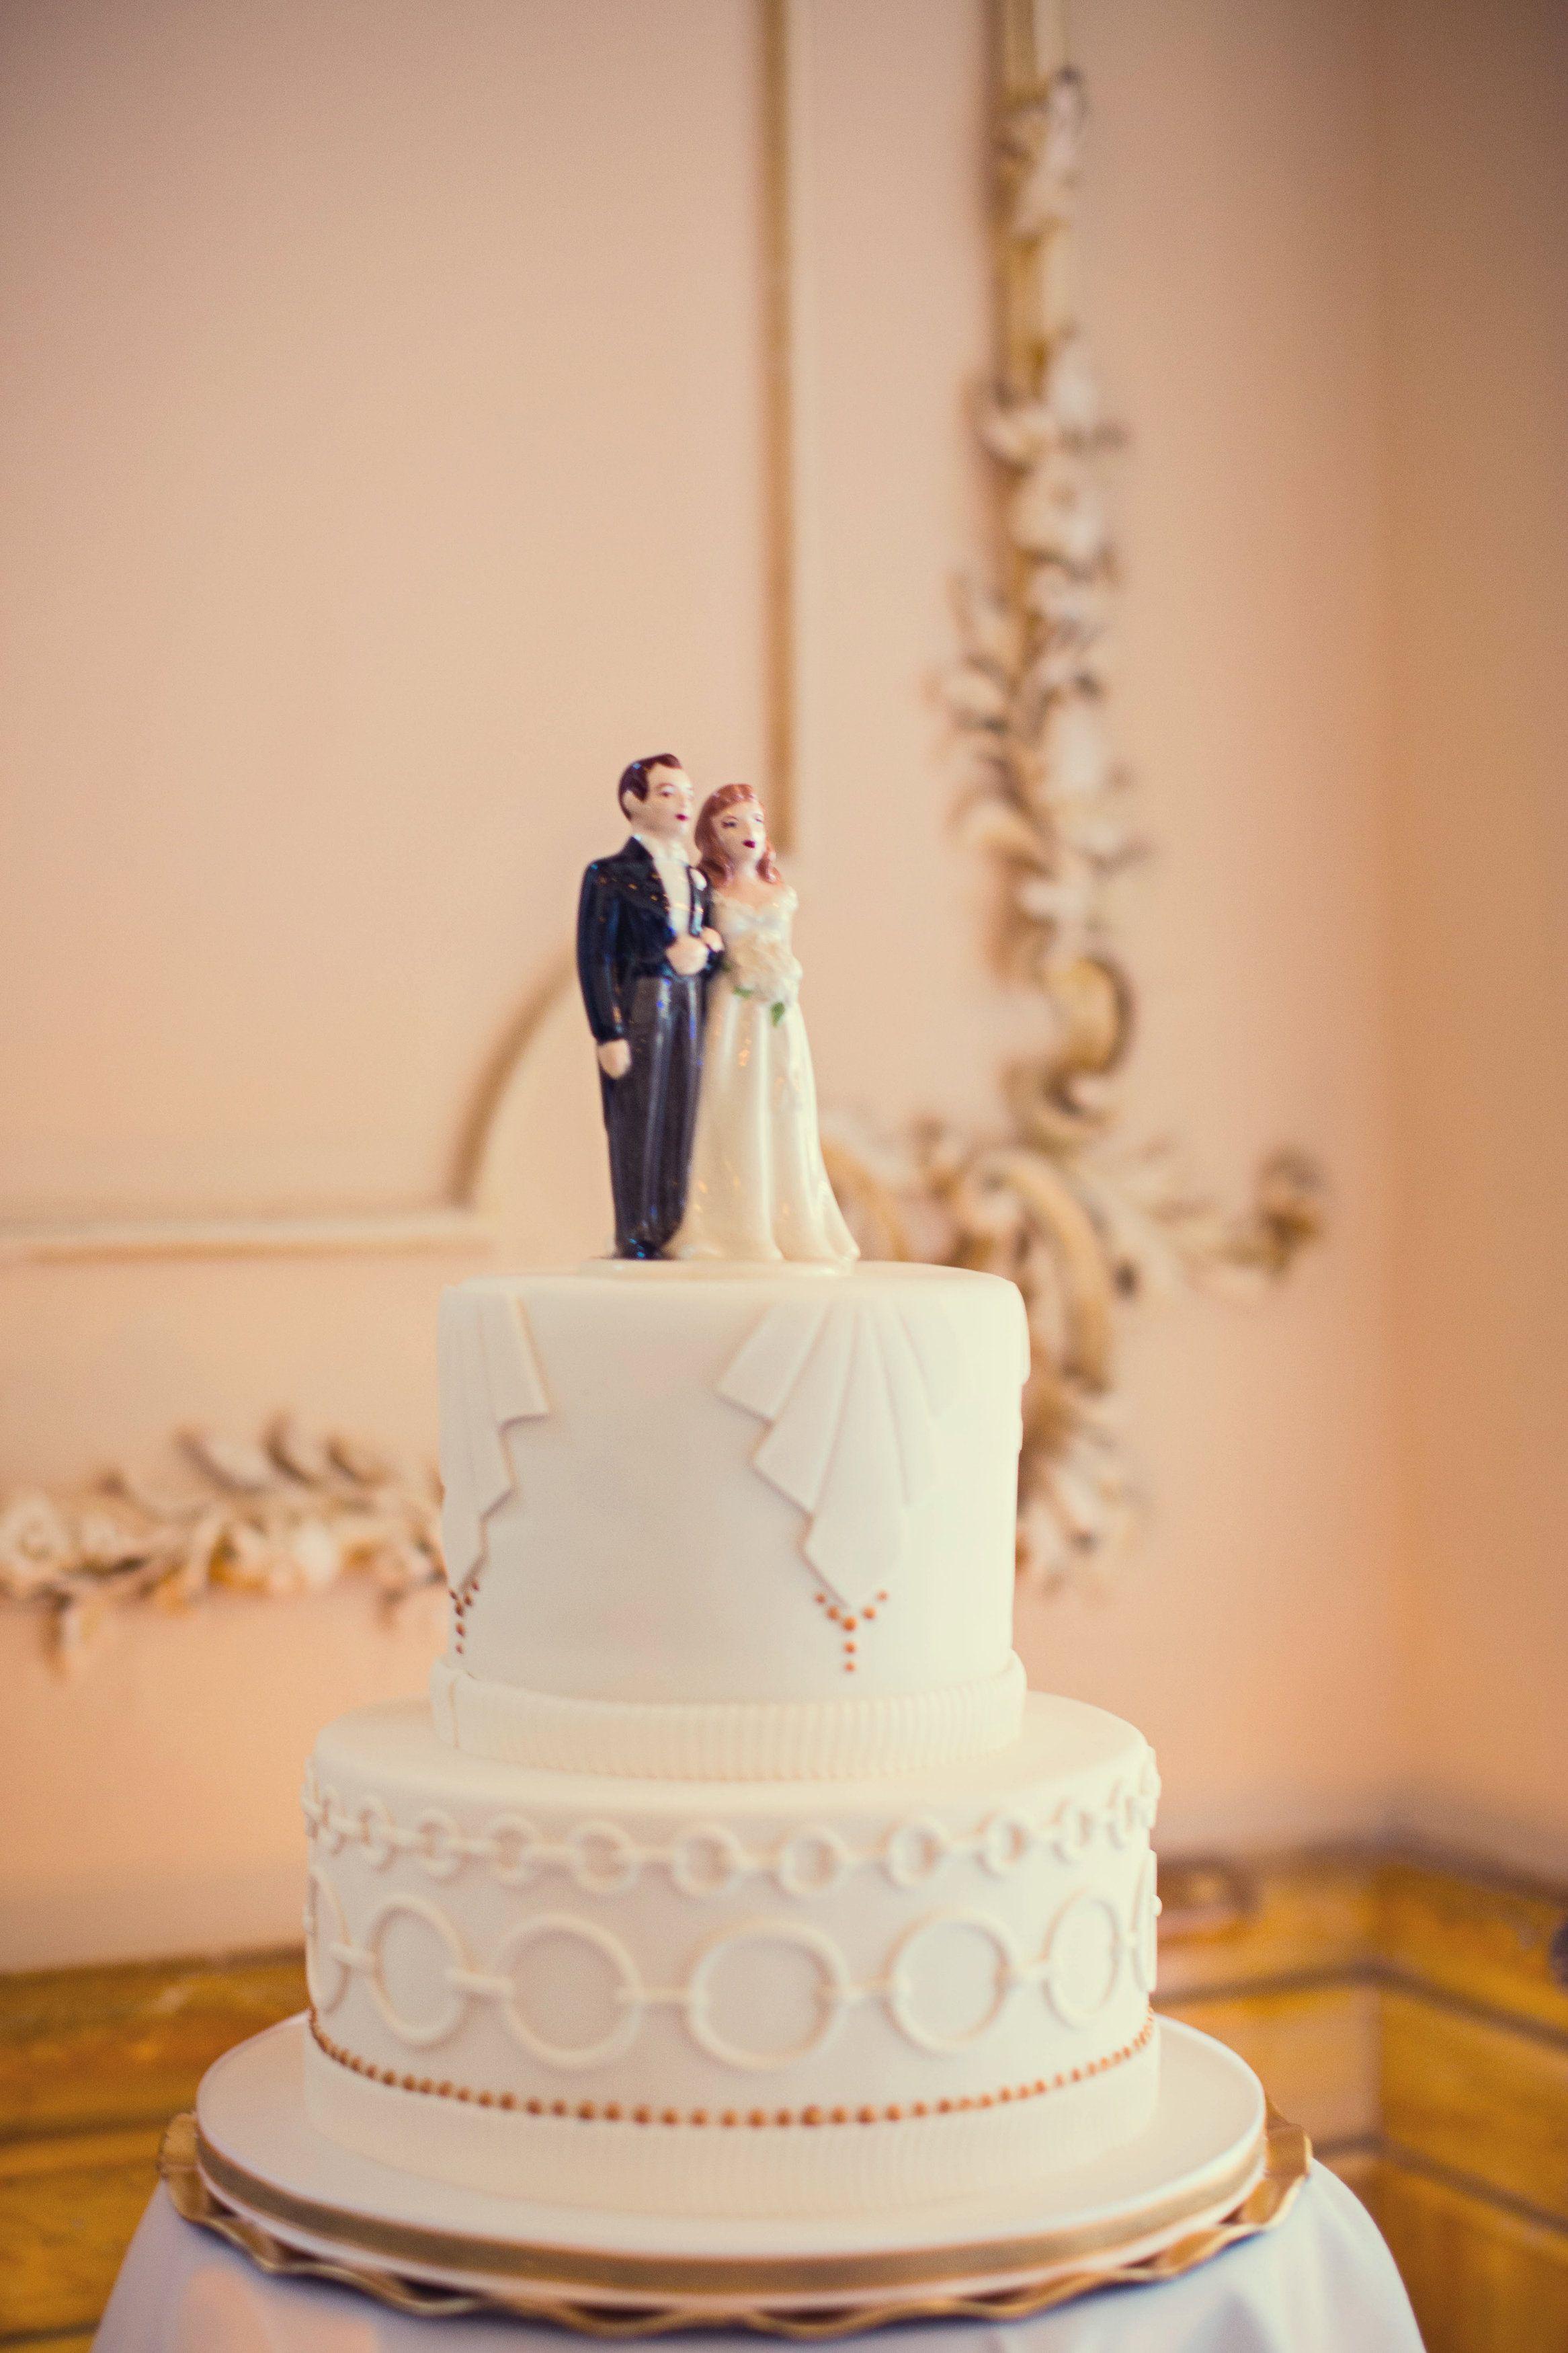 Small 2 Tier Wedding Cakes  small wedding cake art deco wedding cake white wedding